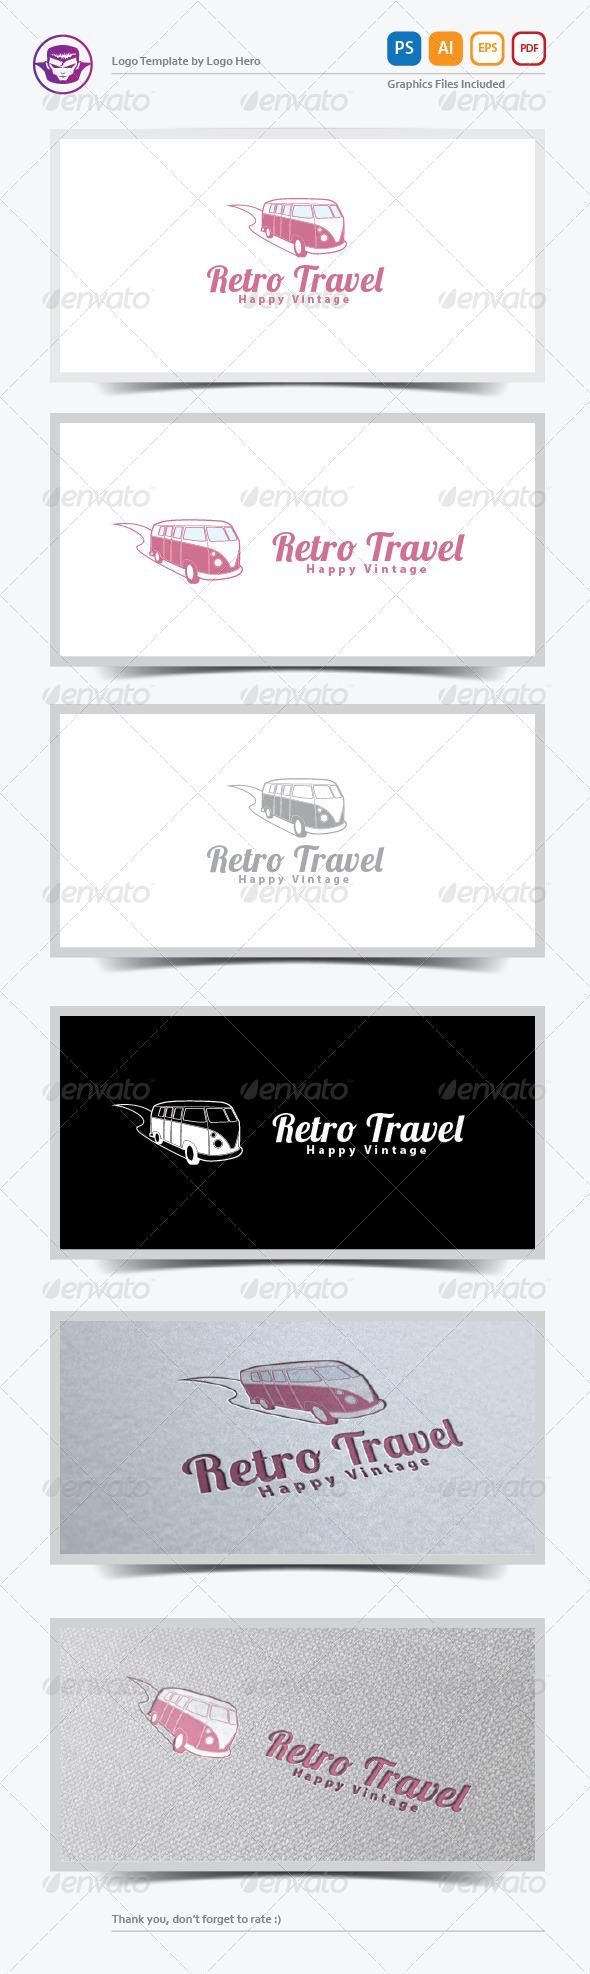 Retro Travel Logo Template - Objects Logo Templates